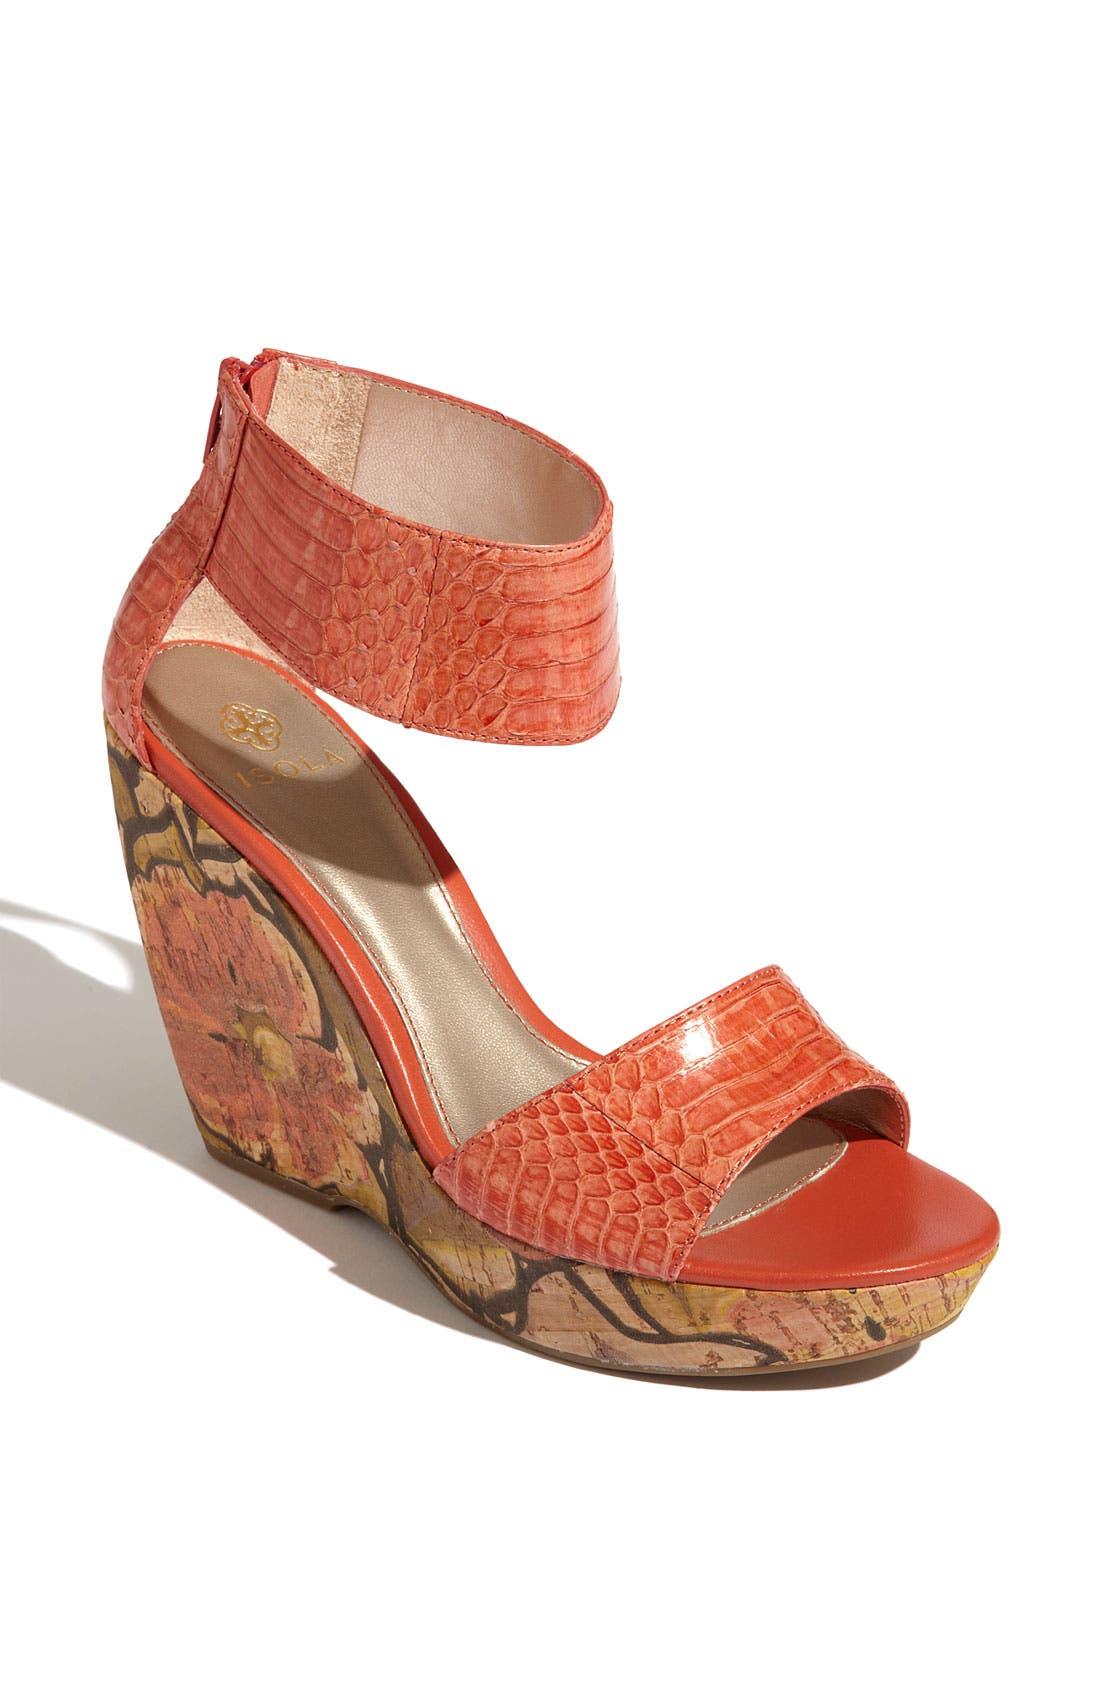 Main Image - Isolá 'Oasis' Wedge Sandal